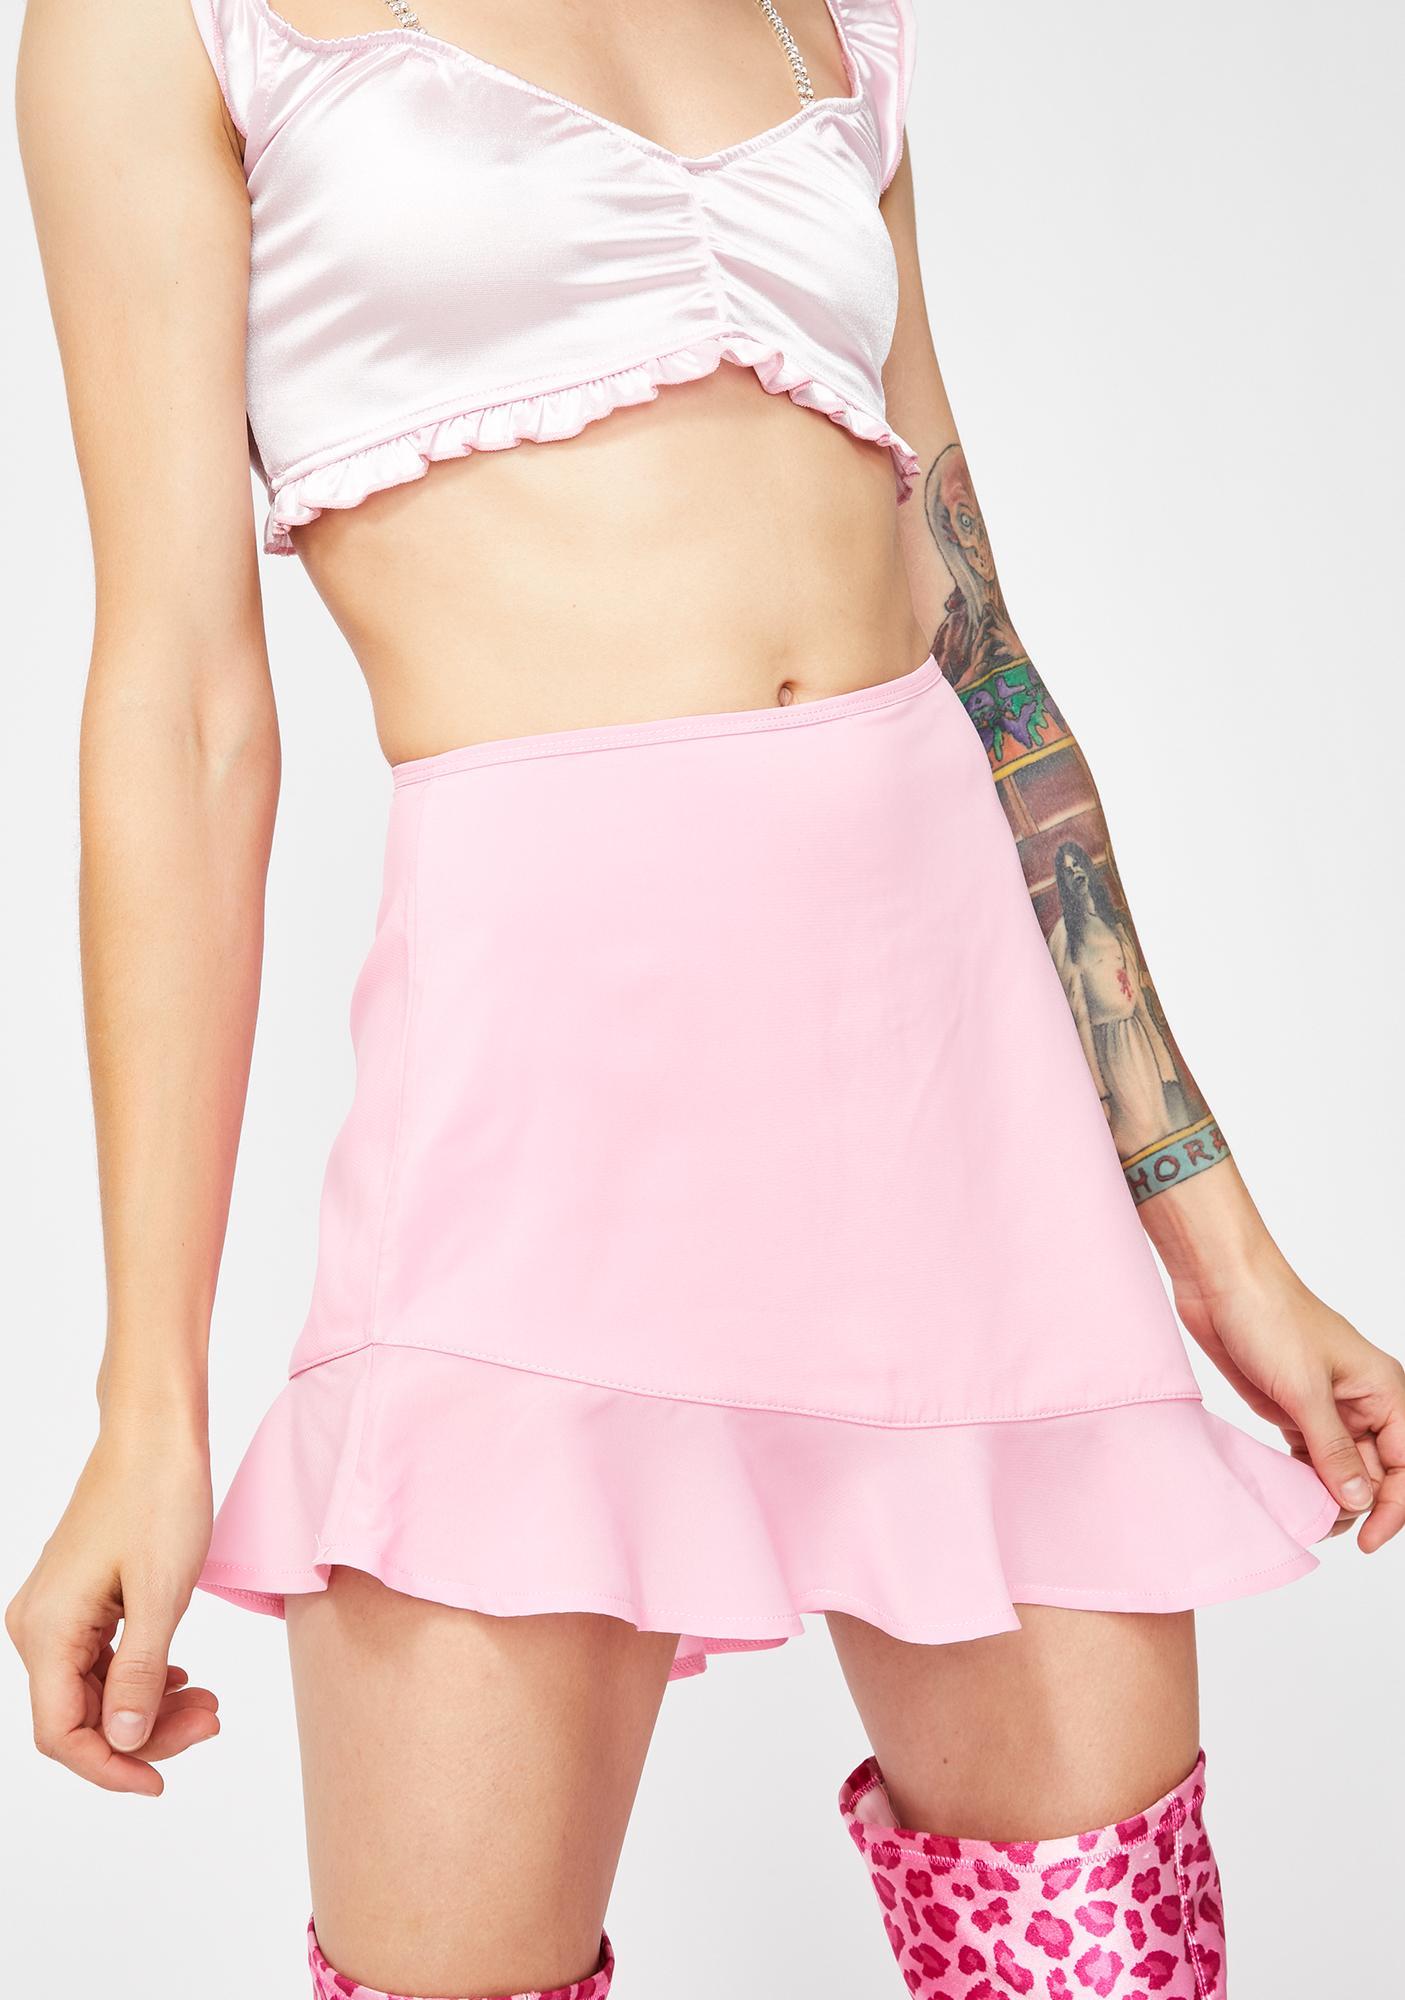 Sugar Thrillz Baby Penthouse Hottie Mini Skirt